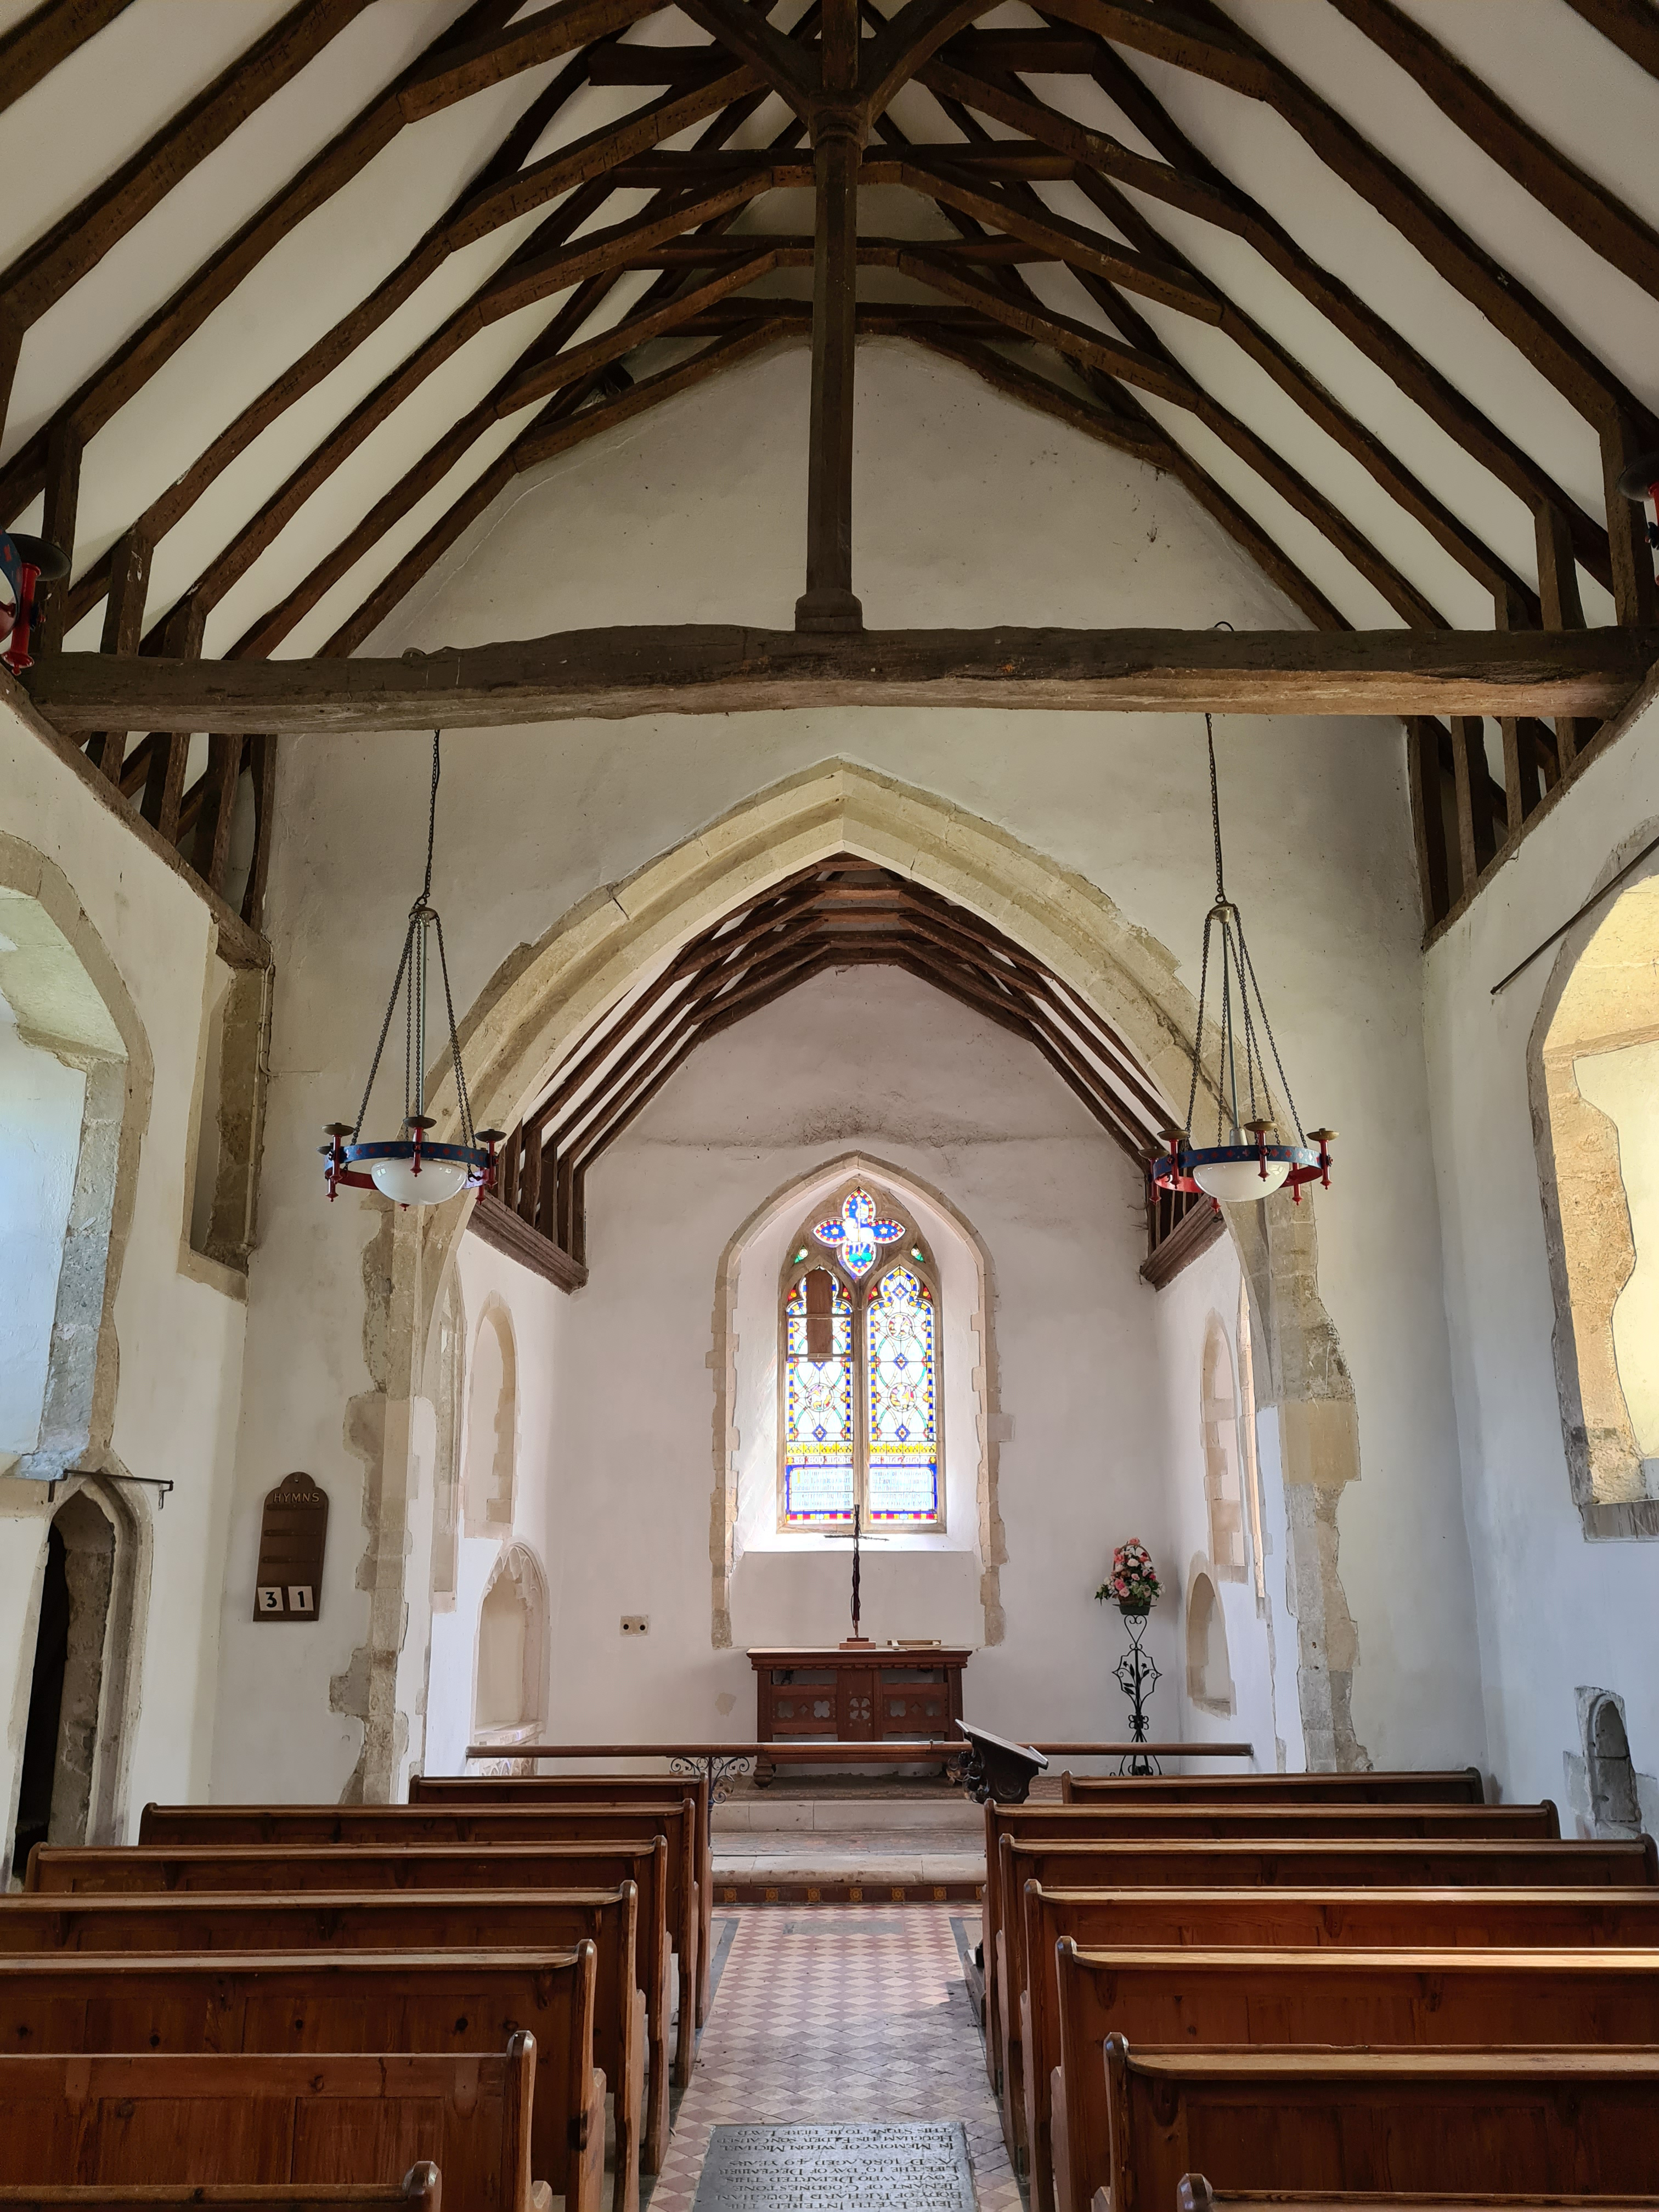 Simple interior of St. Bartholomew's